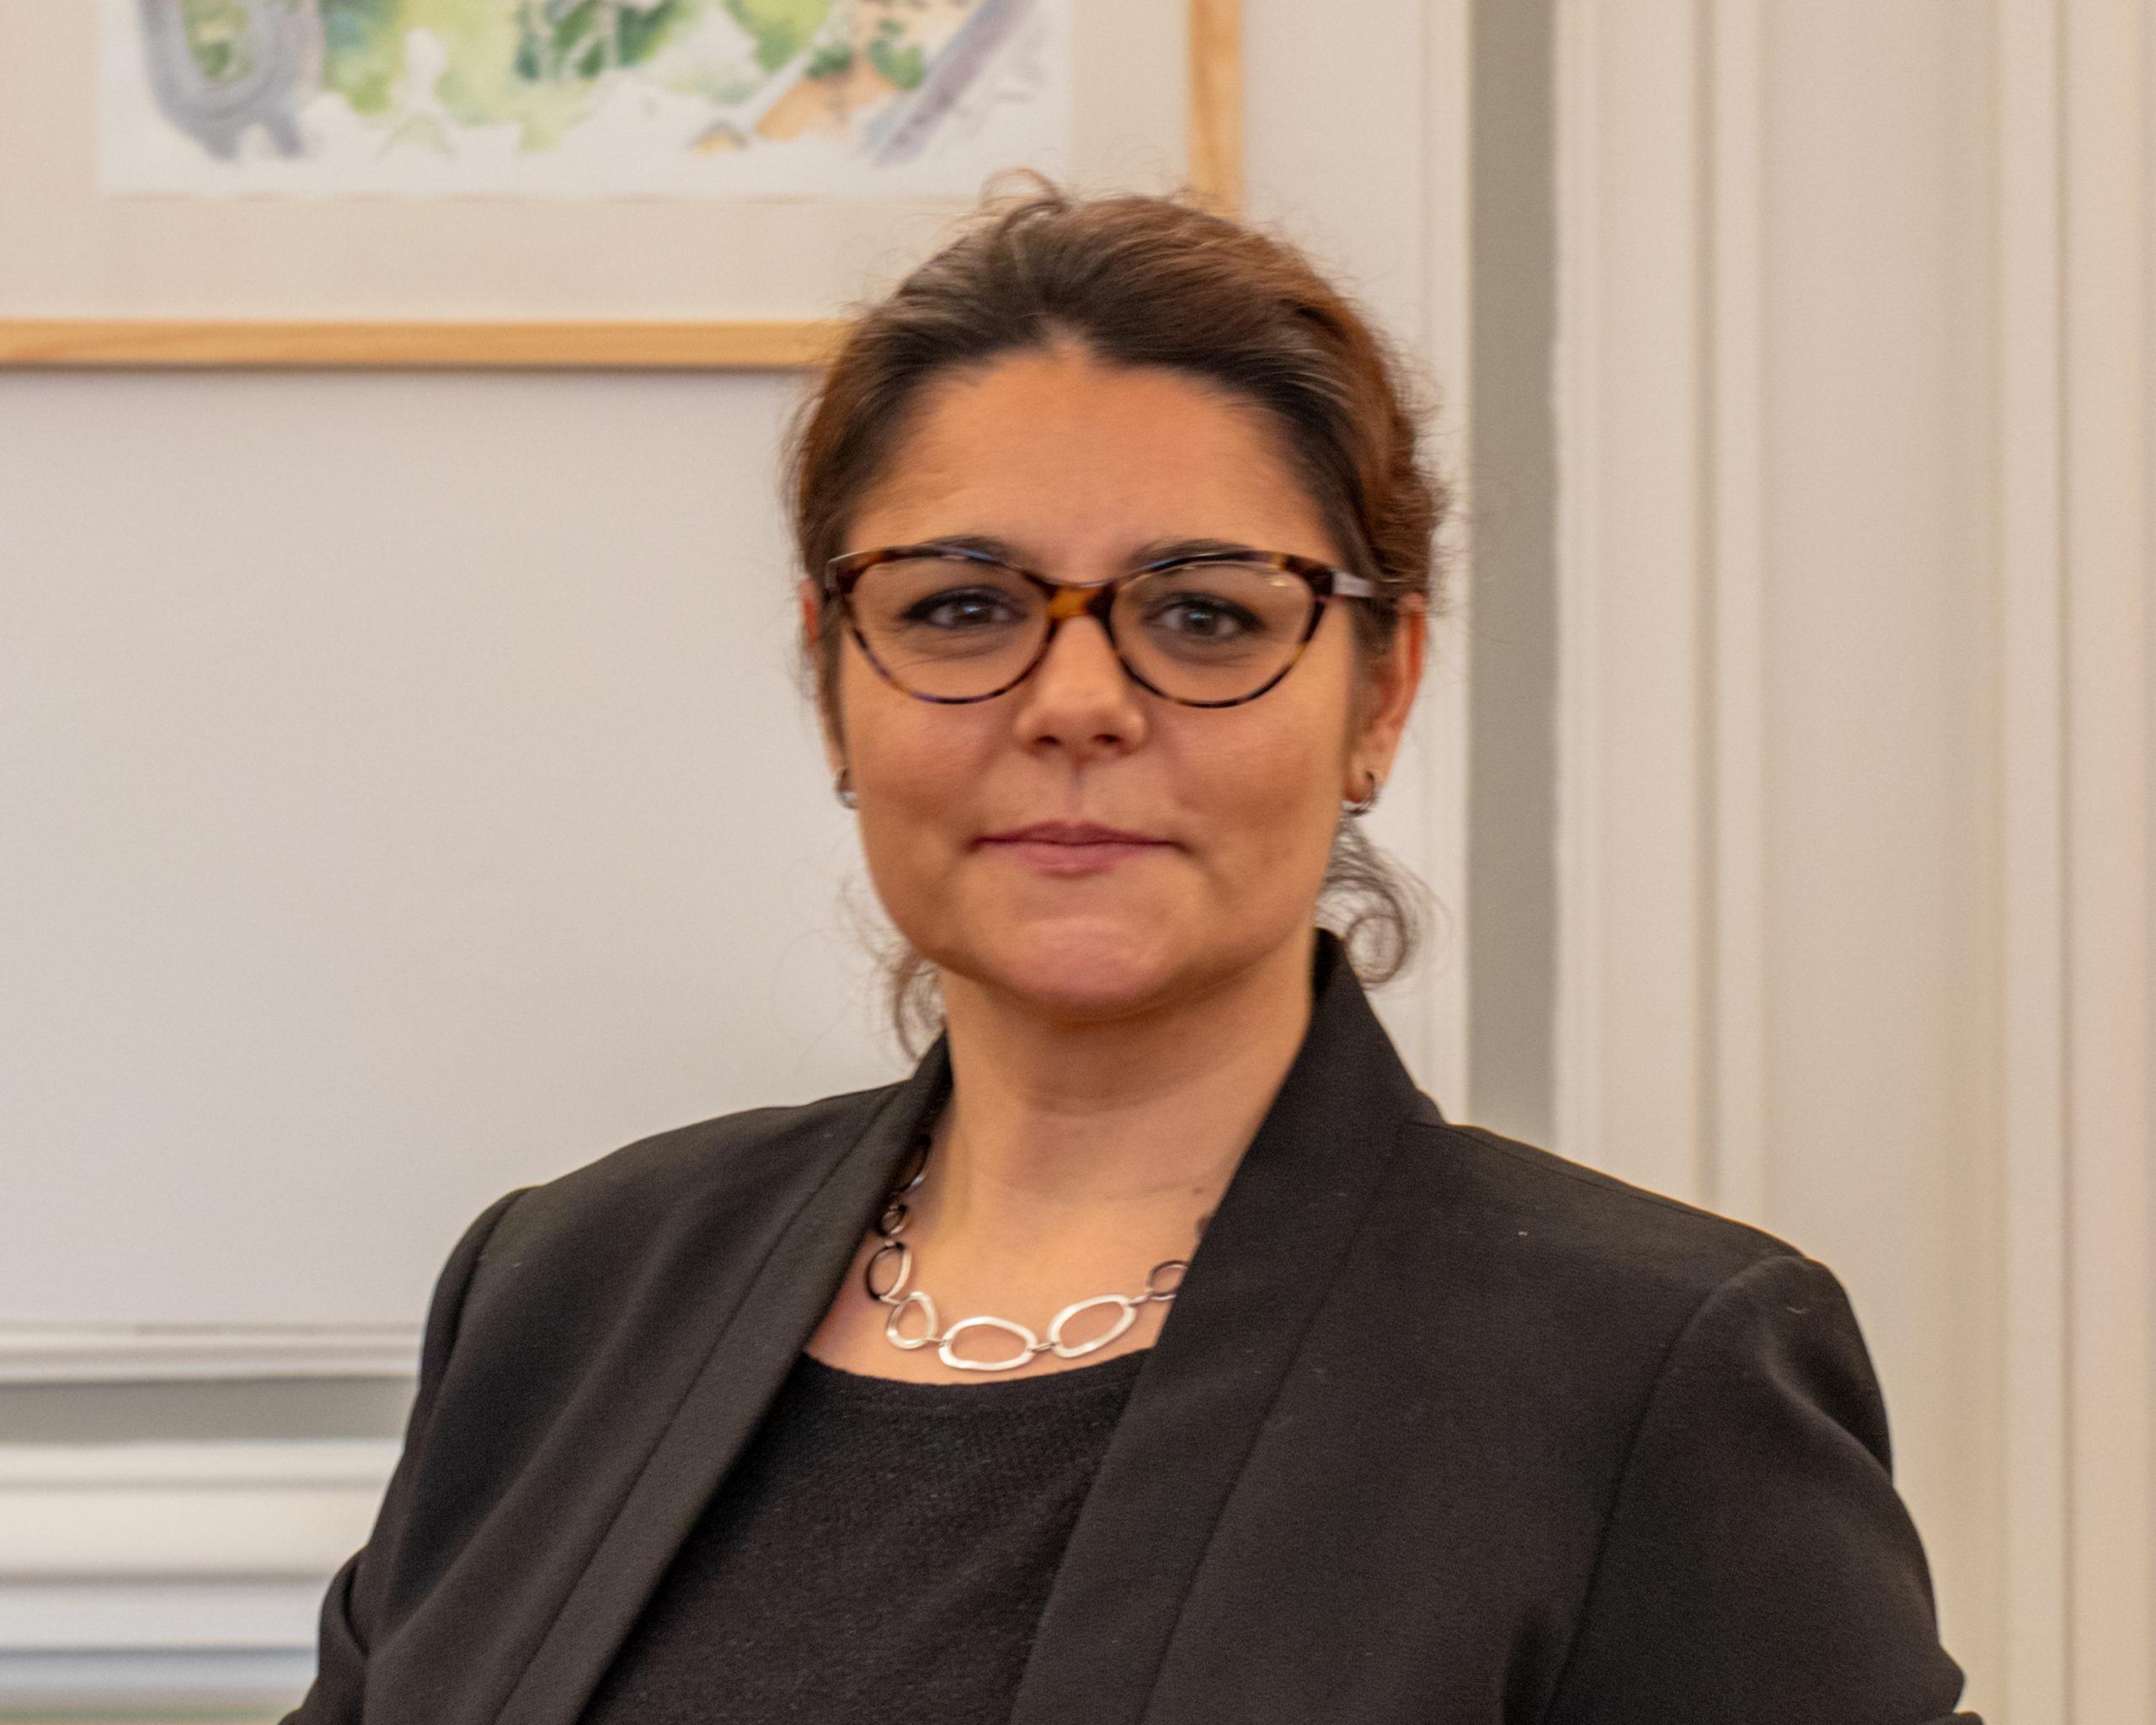 Sylvie GOMES